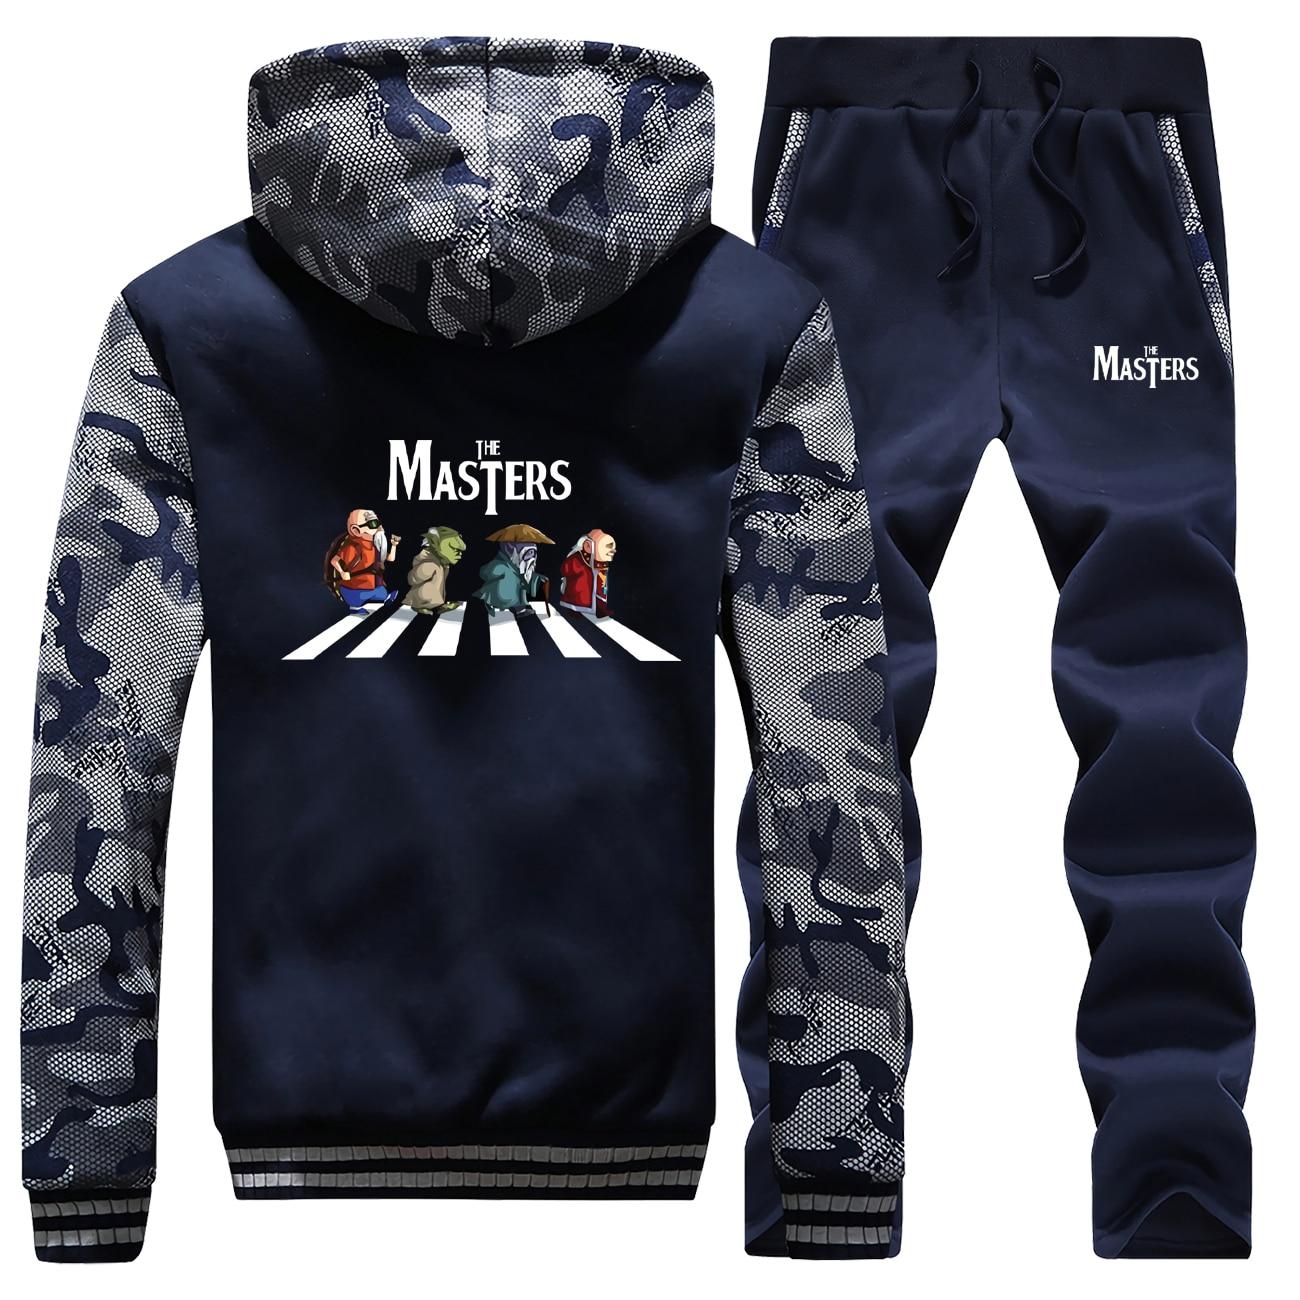 Master Roshi Dragon Ball Cartoon Winter 2019 Camouflage Hoodies Men Sportswear Coat Thick Suit Fleece Jacket+Pants 2 Piece Set